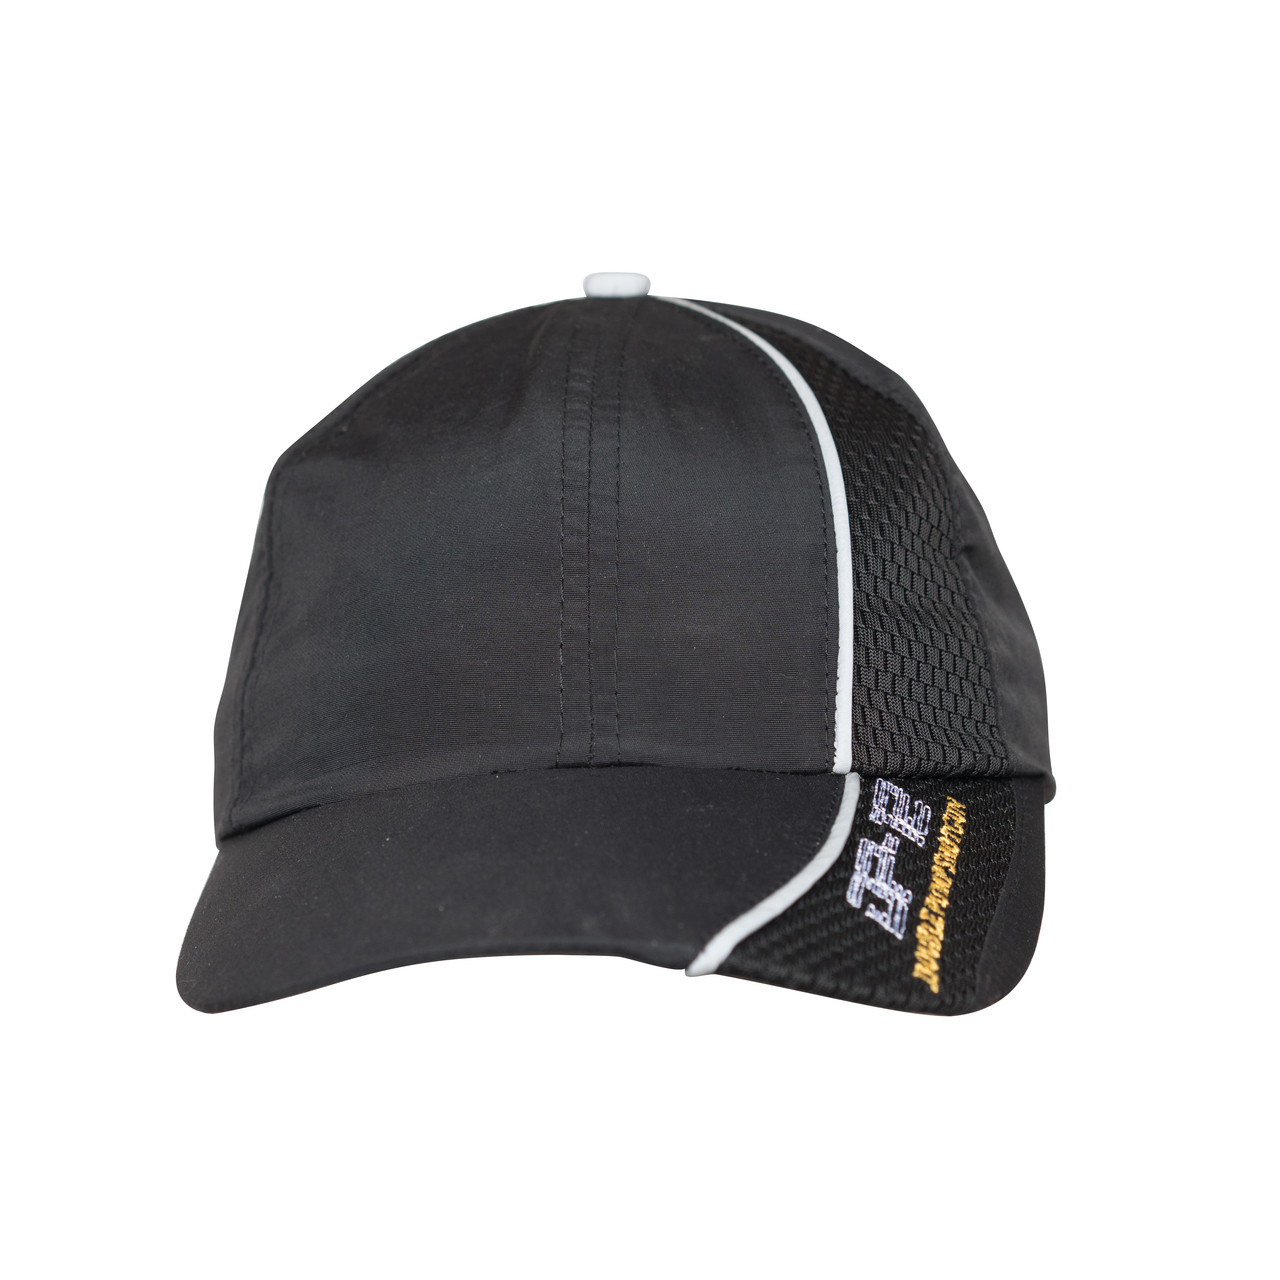 dp-12 black hat - standard mfg. co. llc